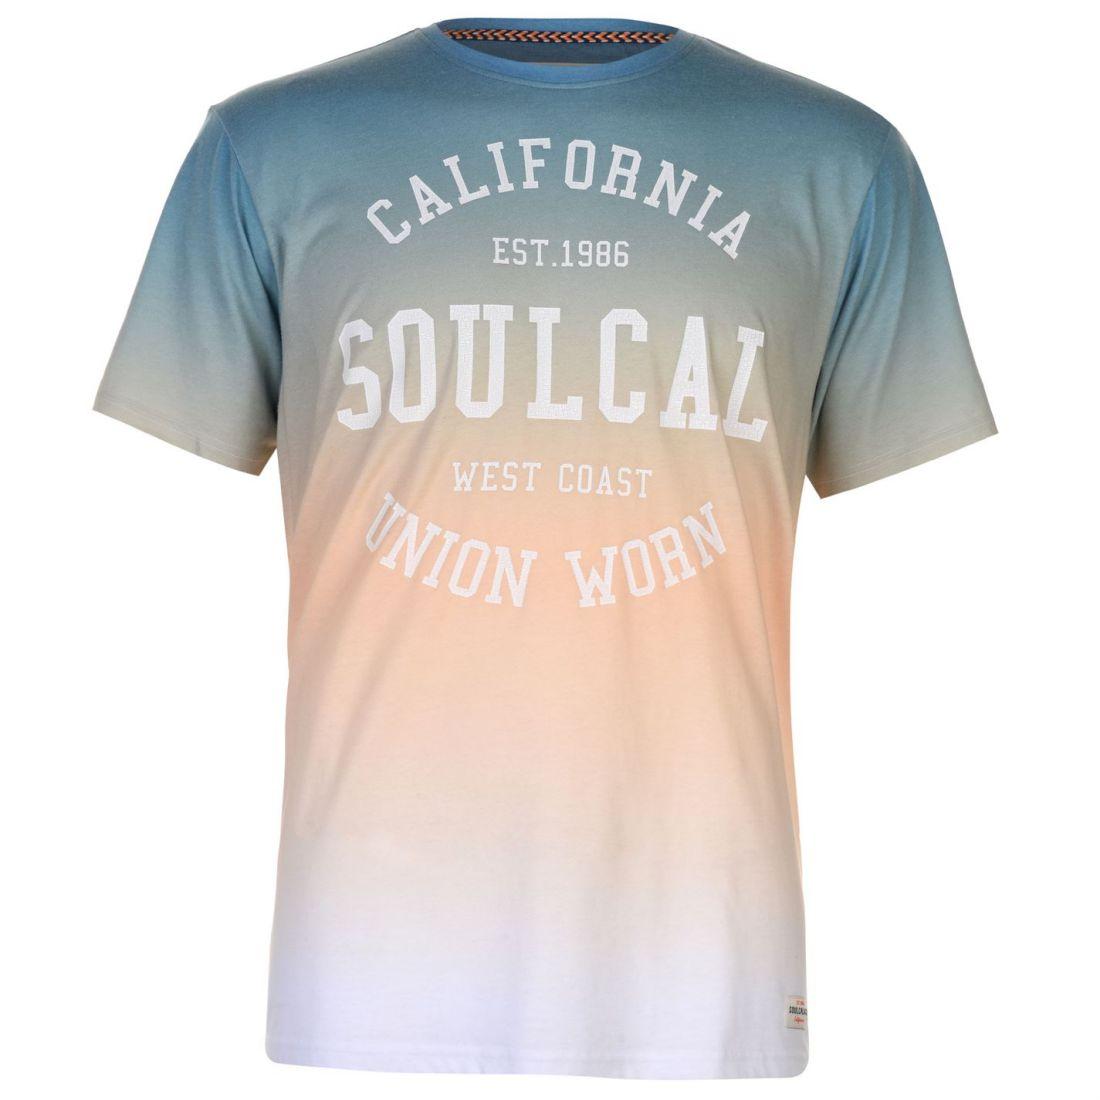 8d6c8652 SoulCal Sublime T Shirt Mens Gents Crew Neck Tee Top Short Sleeve ...